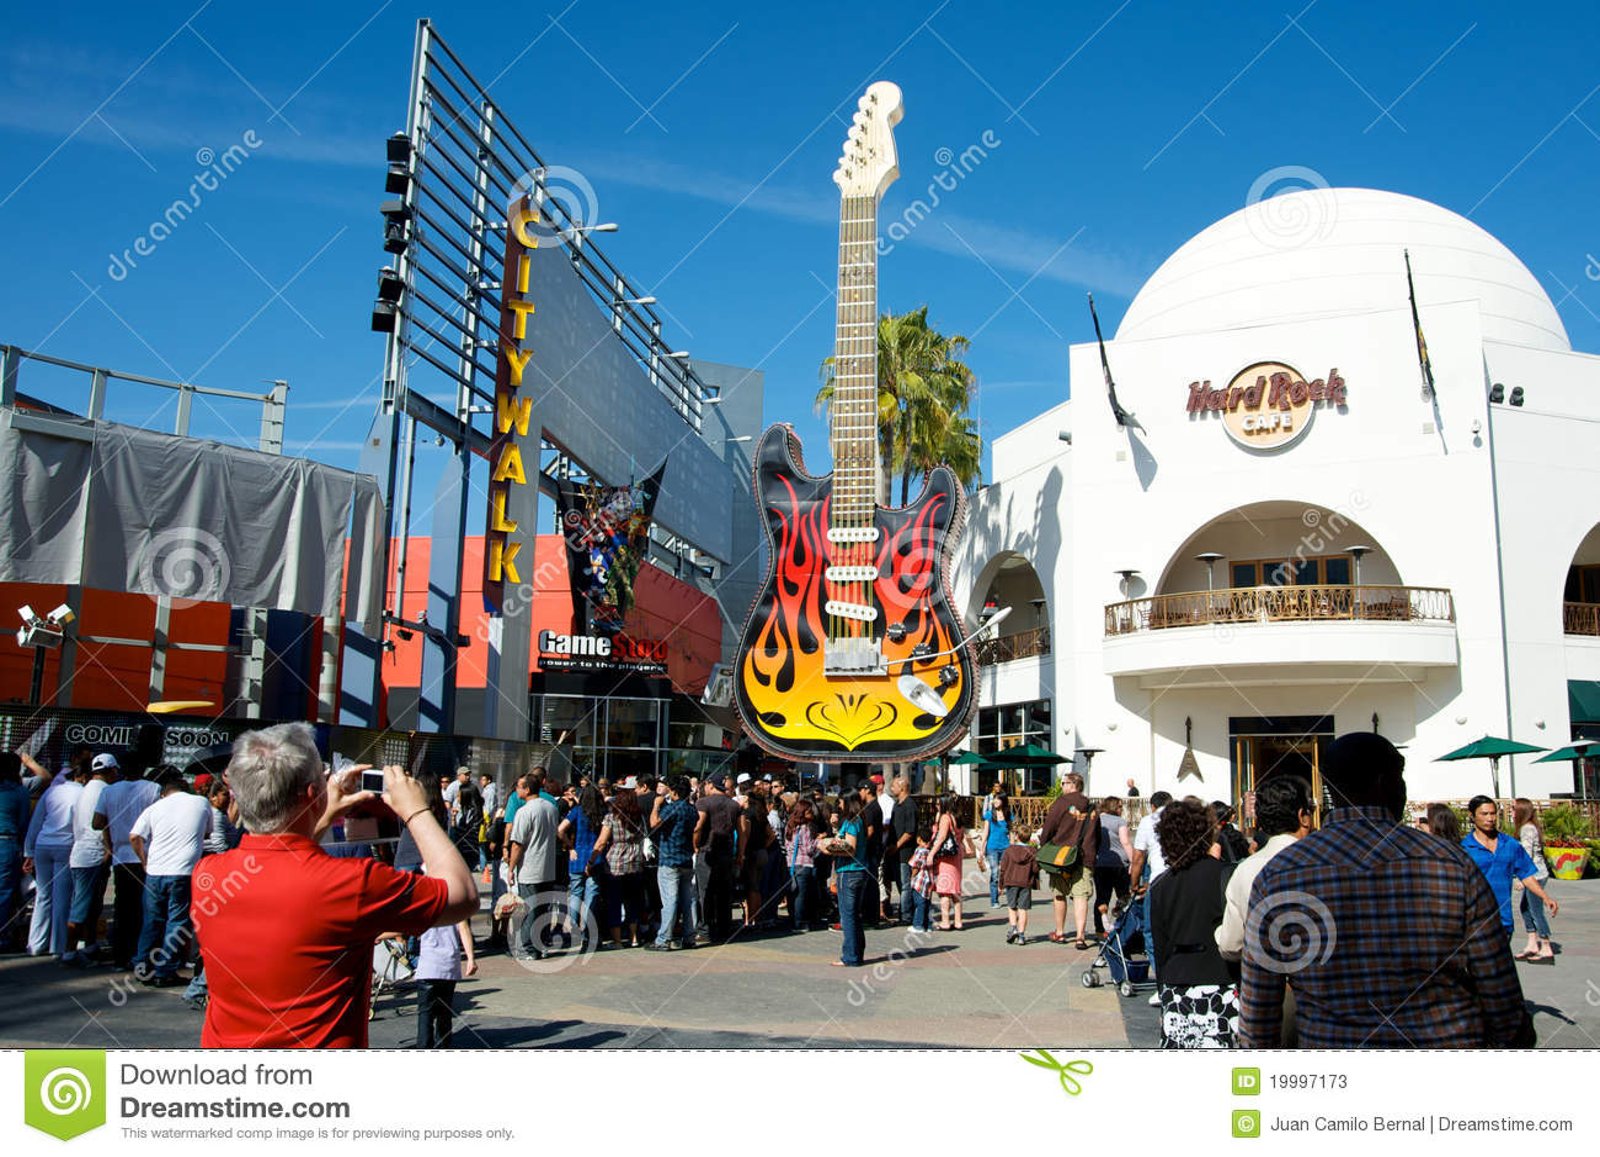 Hard Rock Cafe Citywalk Orlando Prices